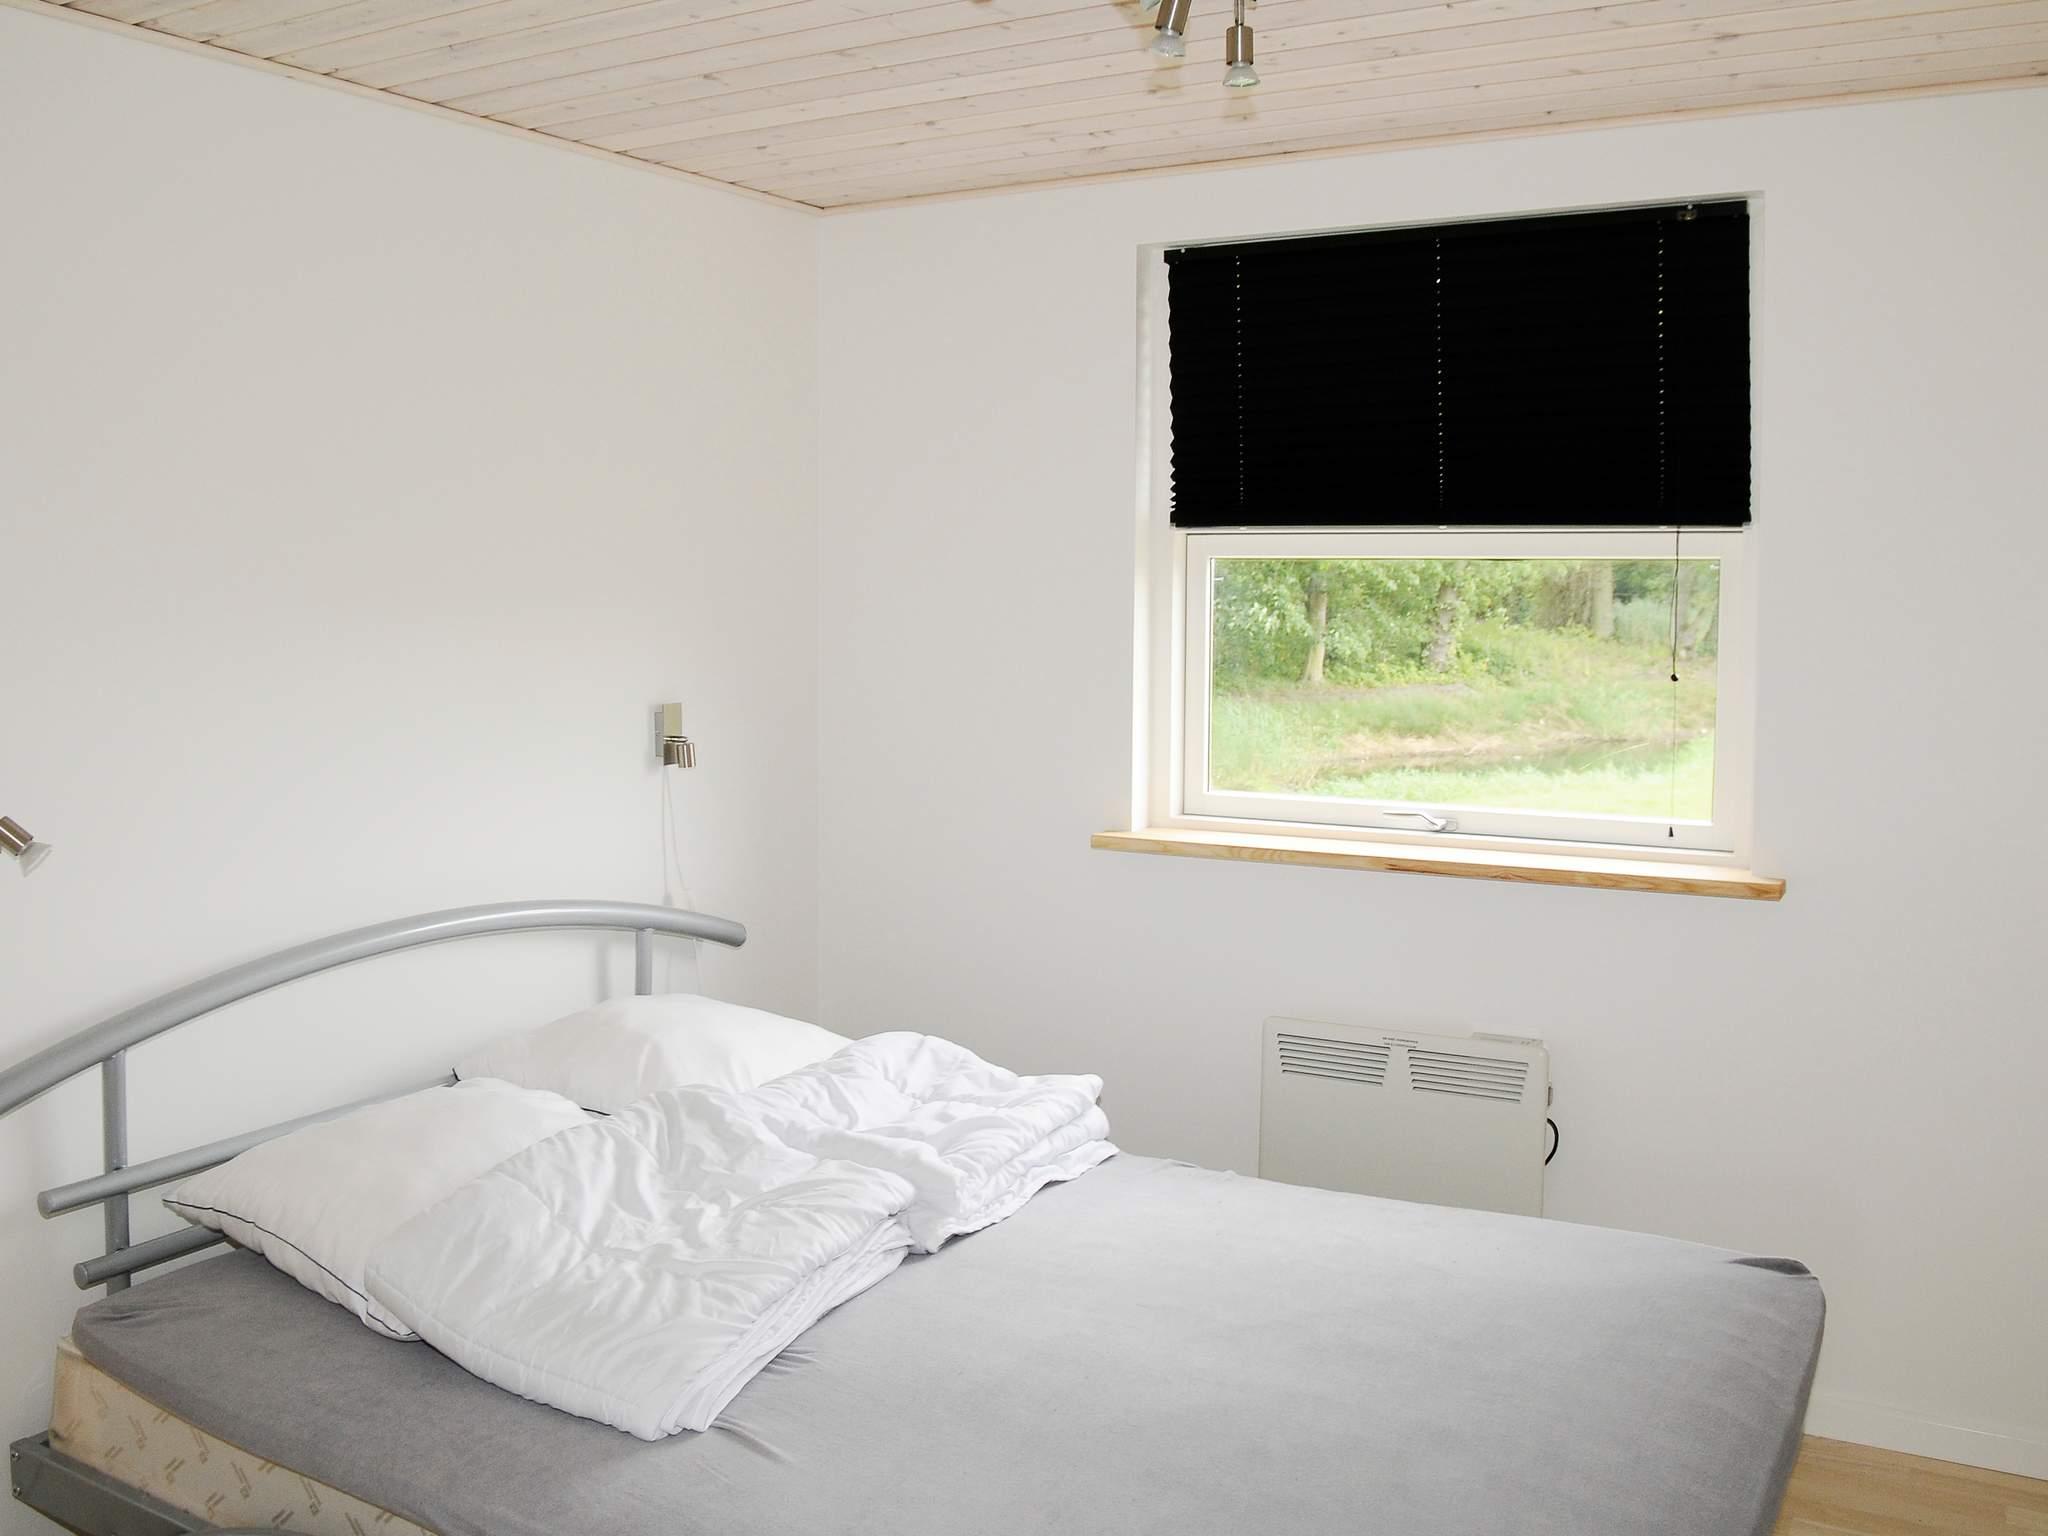 Ferienhaus Fjellerup Strand (336605), Fjellerup, , Ostjütland, Dänemark, Bild 7